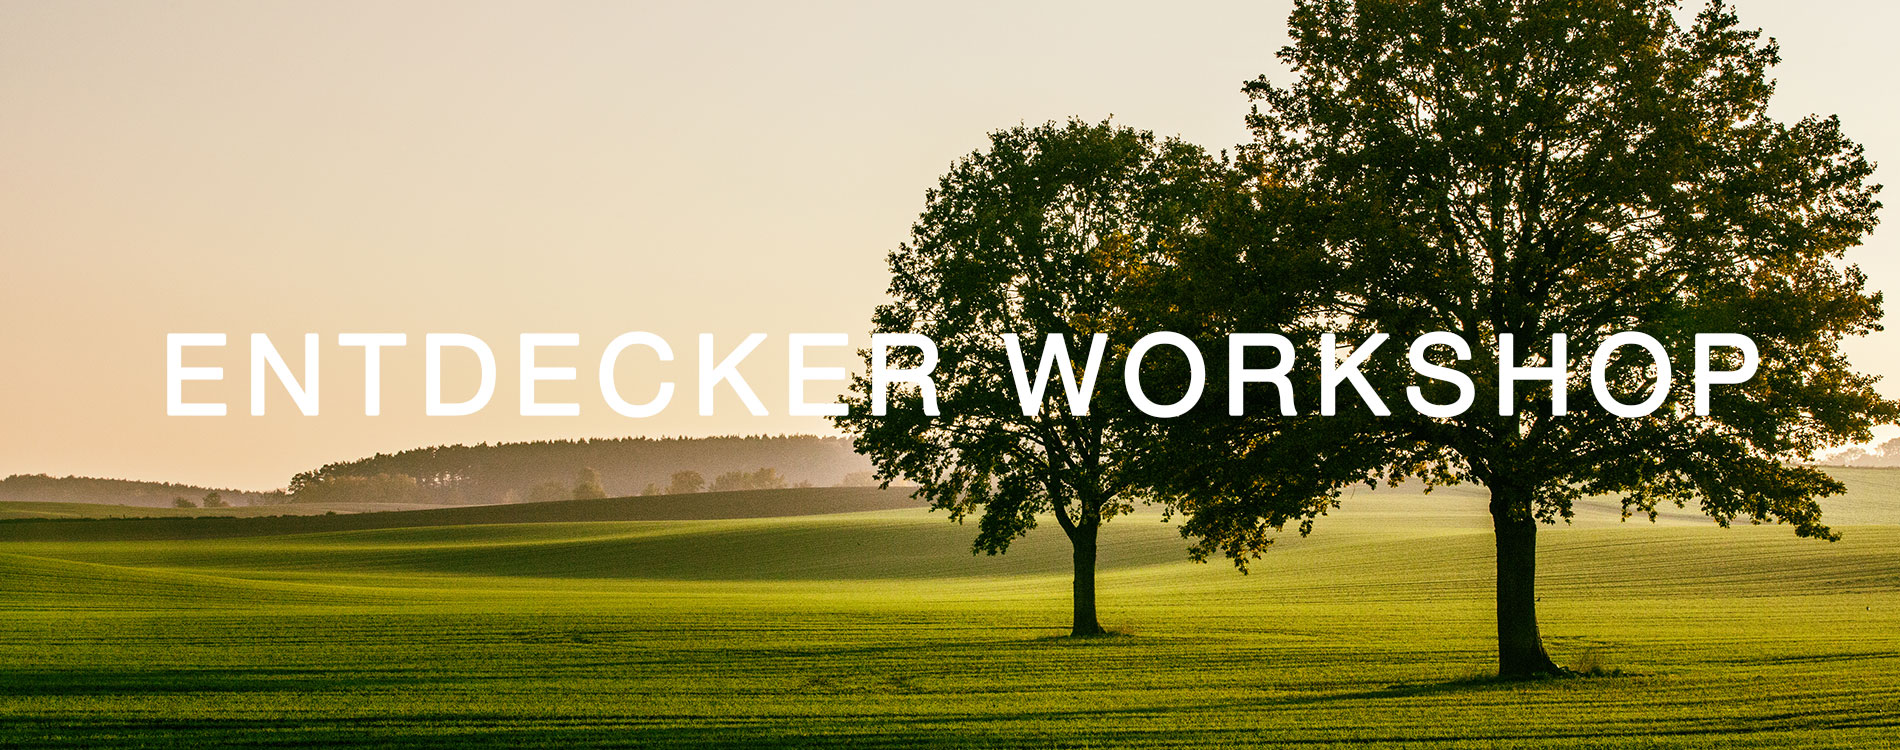 Entdecker Workshop